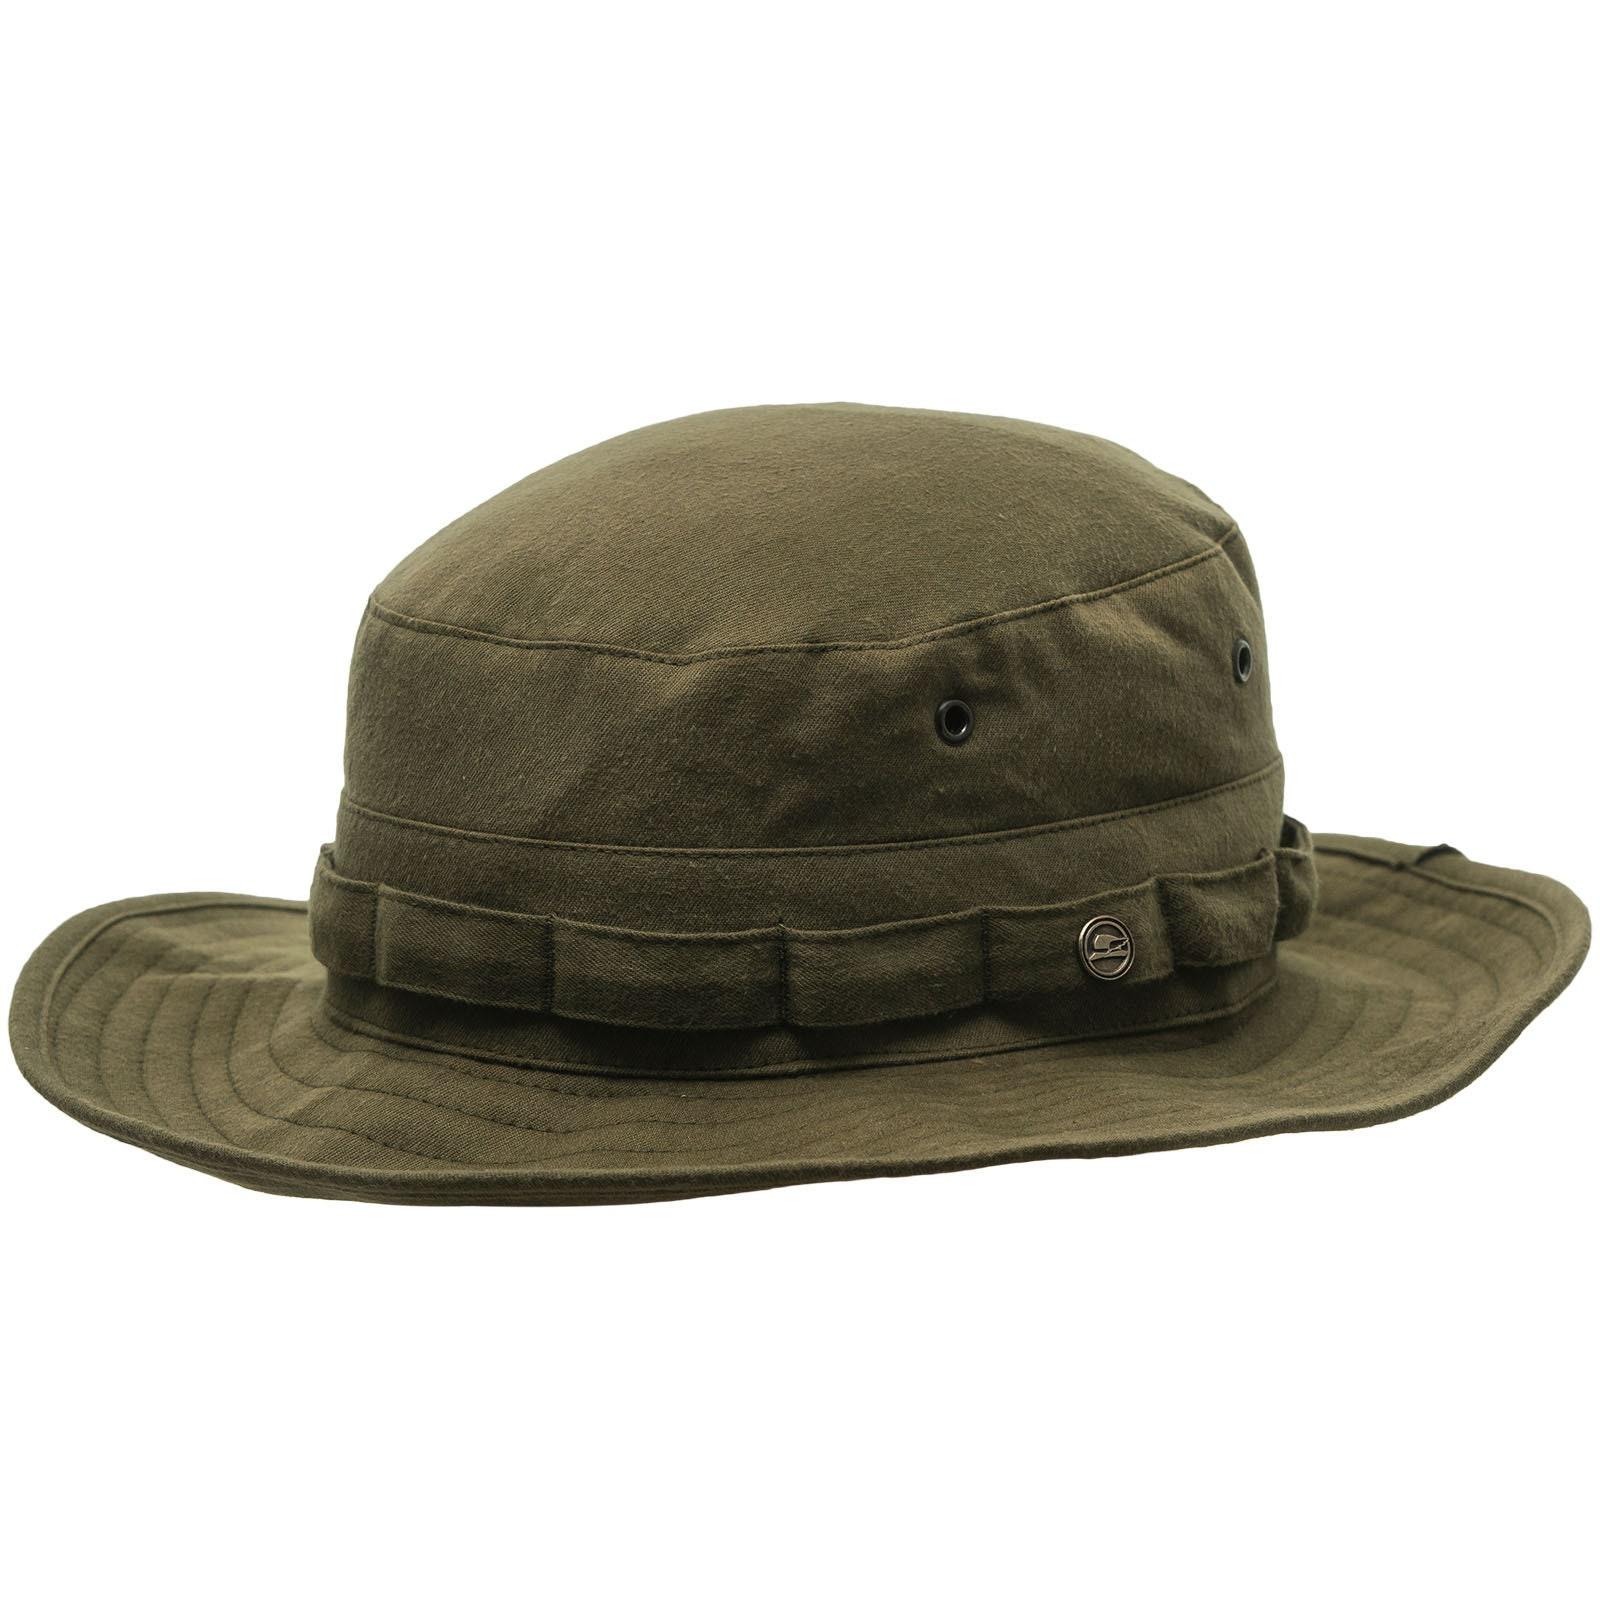 AFGHAN Safari Hiking Cotton Hat olive